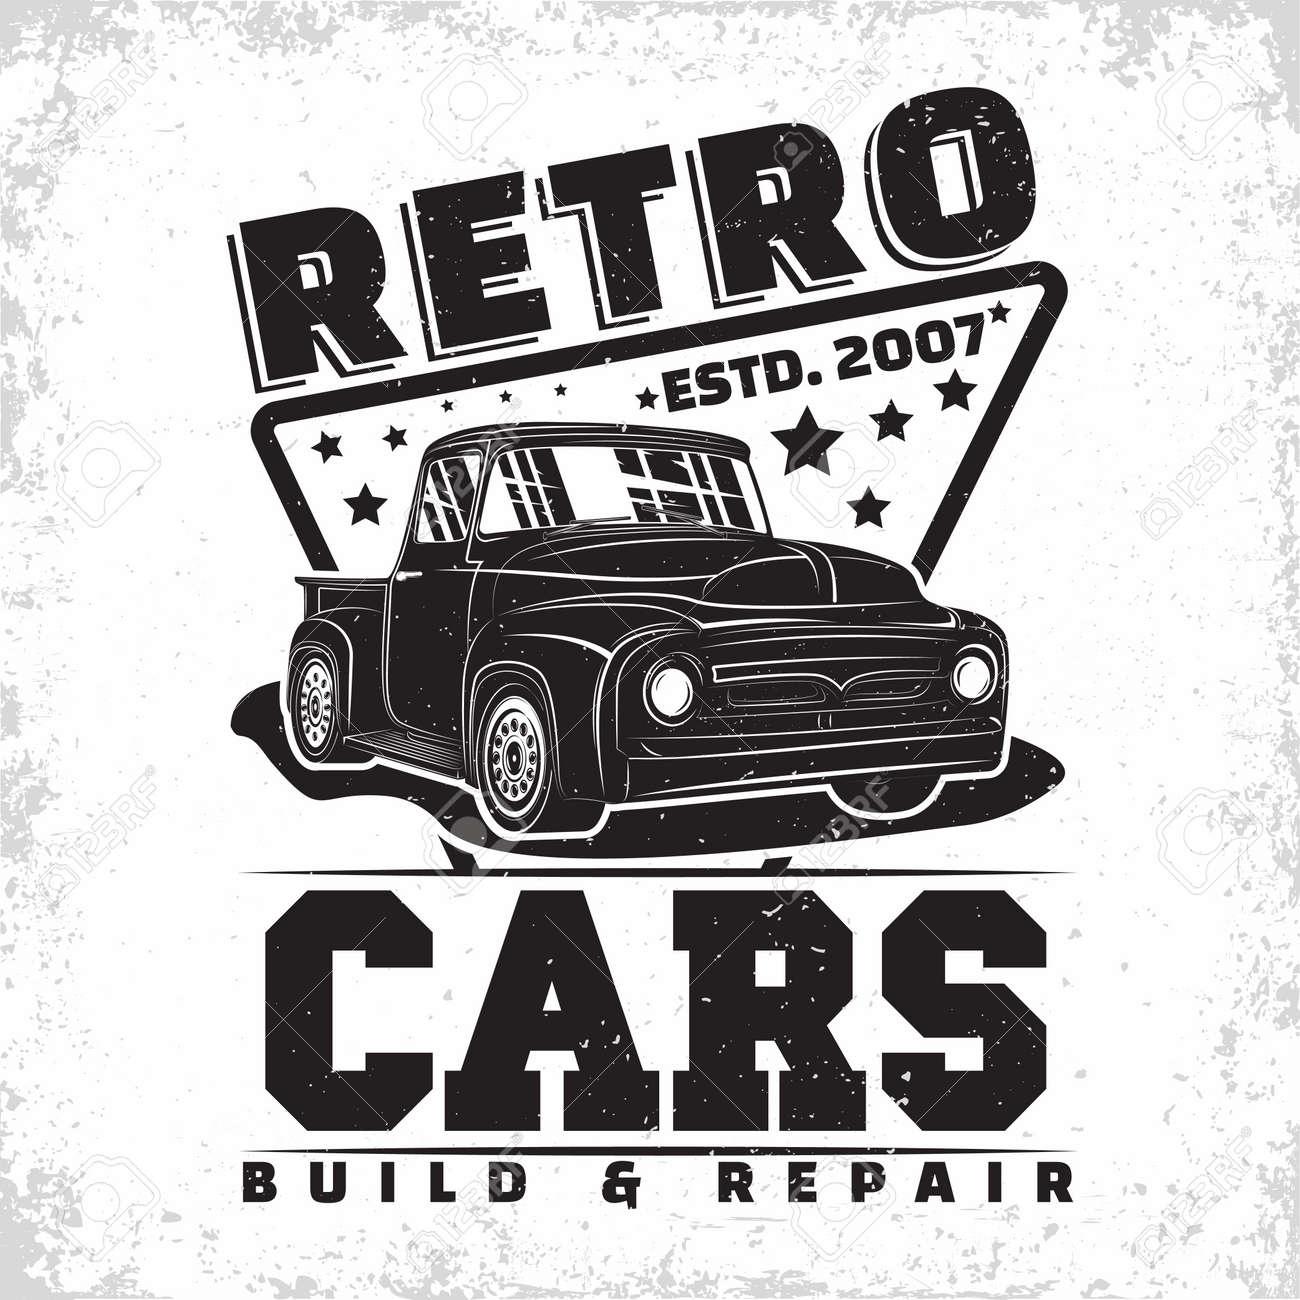 Hot Rod garage design, emblem of muscle car repair and service organization, retro car garage print stamps, hot rod typography emblem, Vector - 154820116